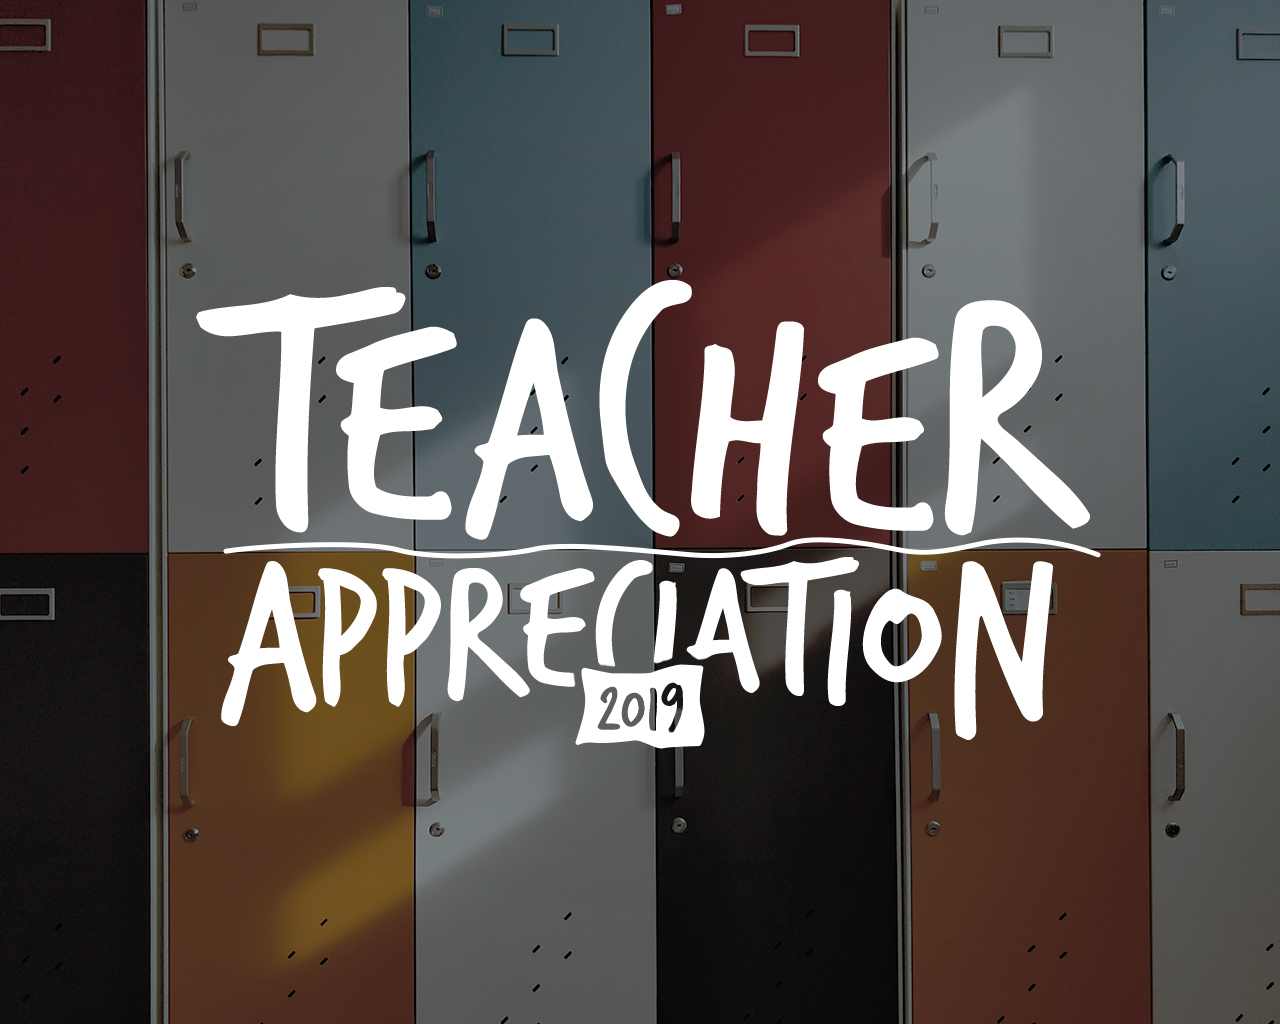 TeacherAppreciation.jpg